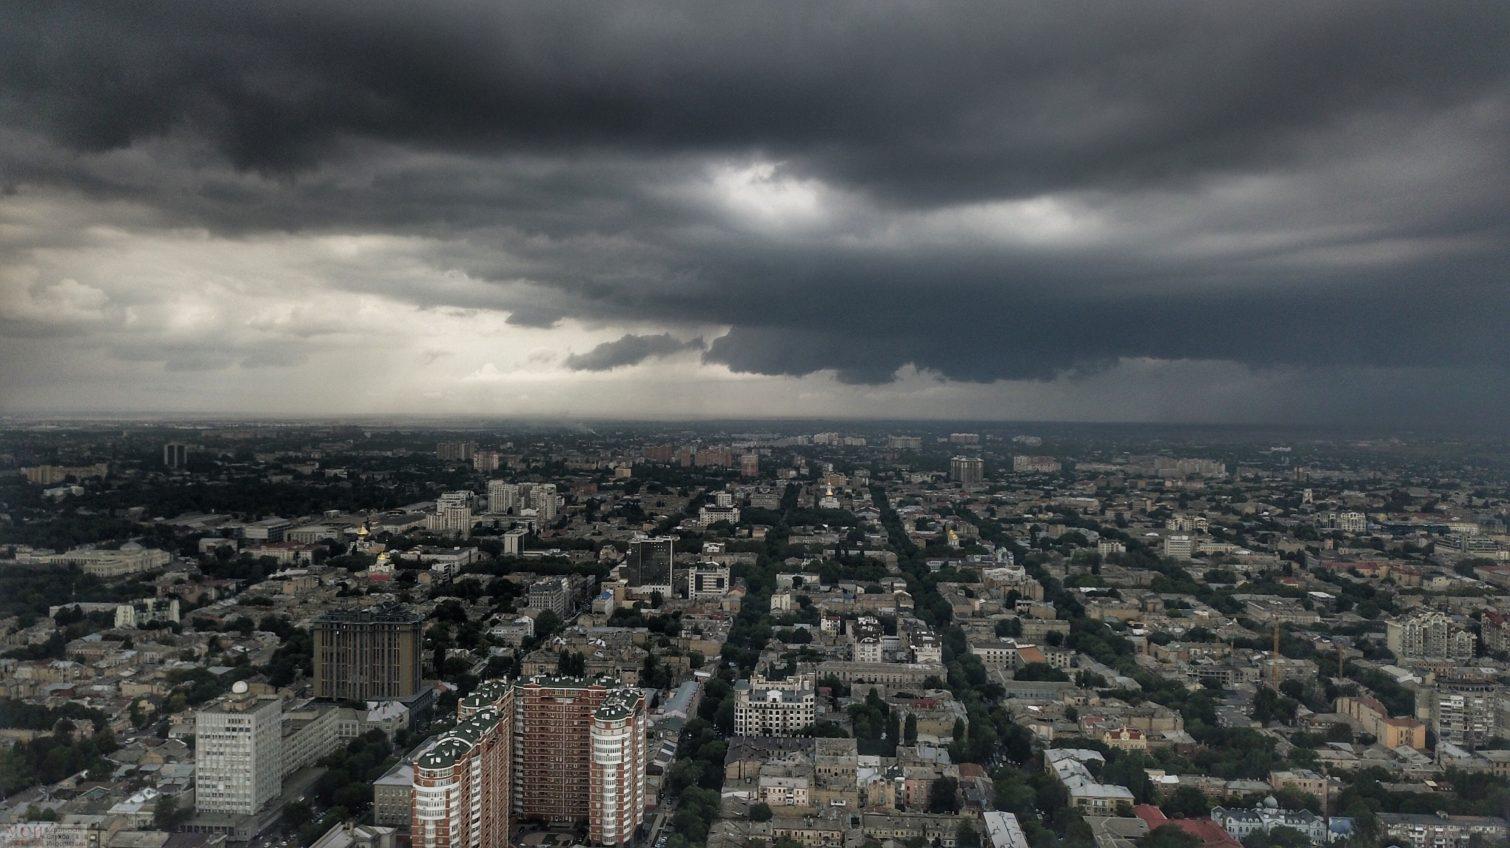 Штормовое предупреждение: в Одессе вот-вот обещают сильную грозу и ливень (фото) «фото»